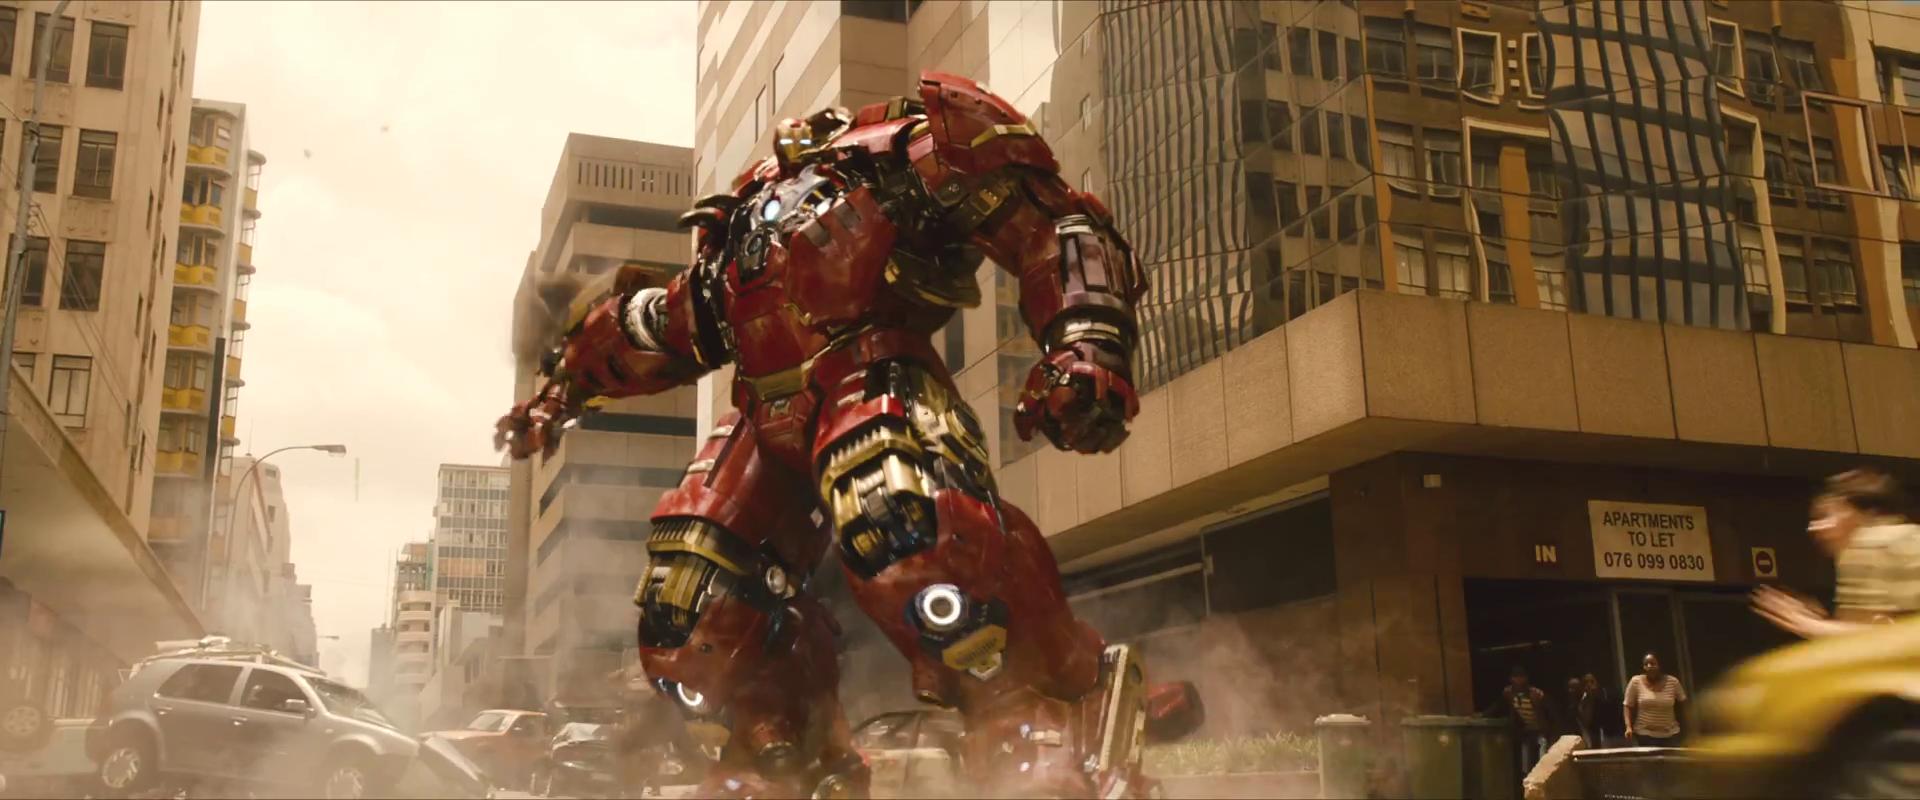 avengers-age-of-ultron-trailer-screengrab-15-hulkbuster.png